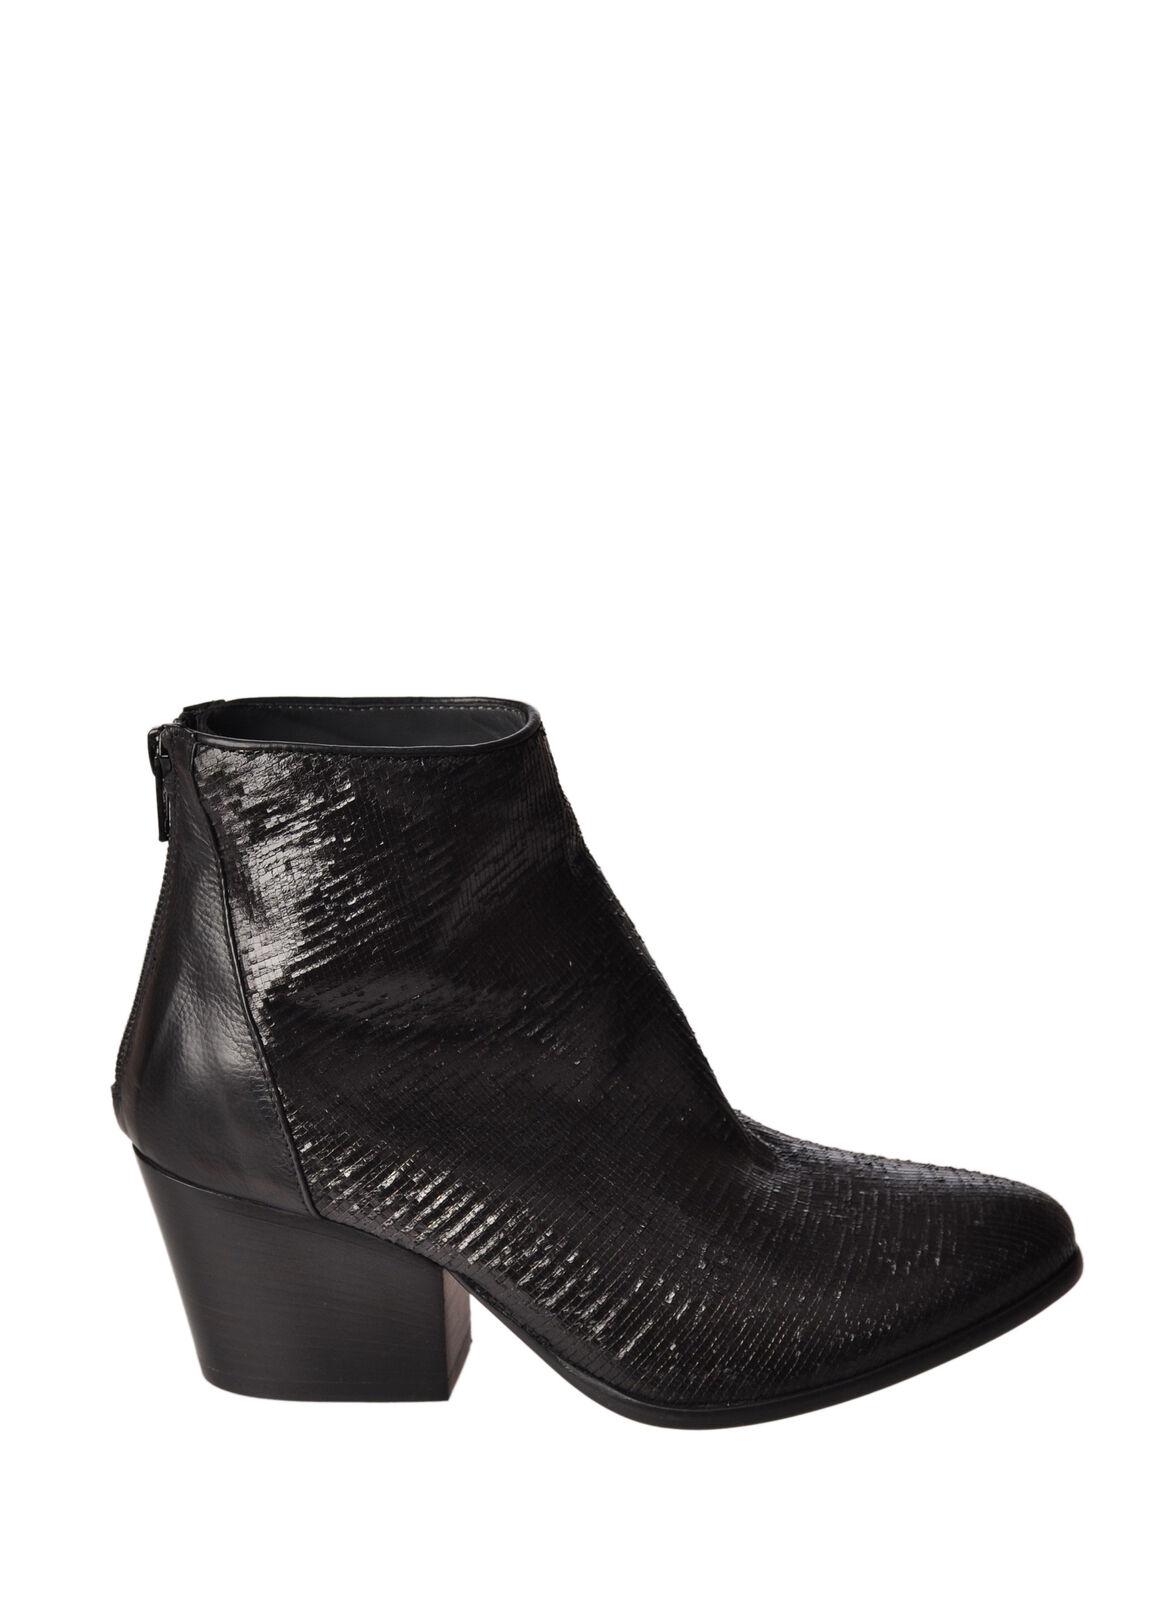 Fiorifrancesi  -  Ankle boots - Female - Black - 2869220A185735